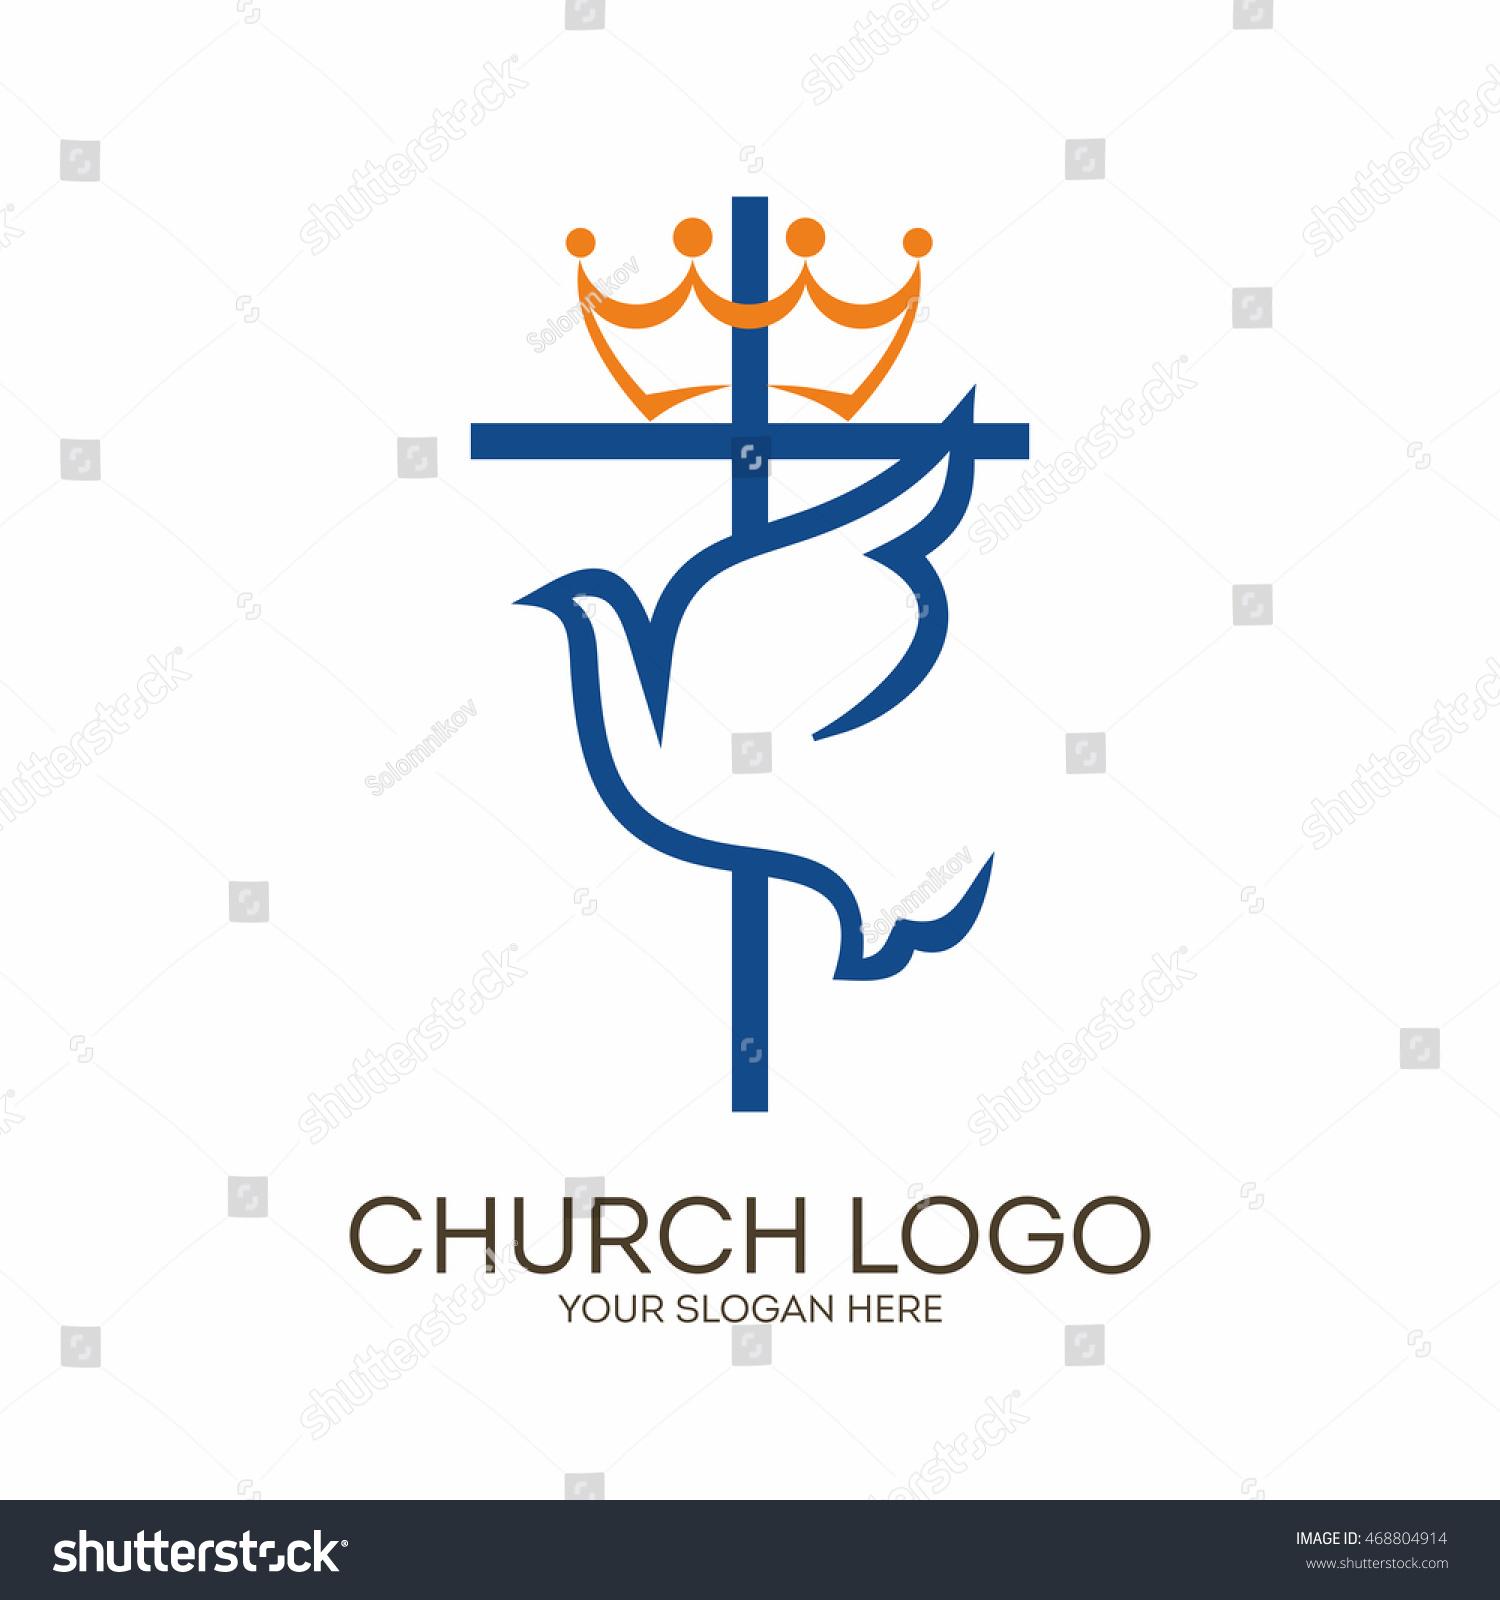 Church logo christian symbols cross dove stock vector 468804914 church logo christian symbols cross and dove holy spirit thecheapjerseys Gallery